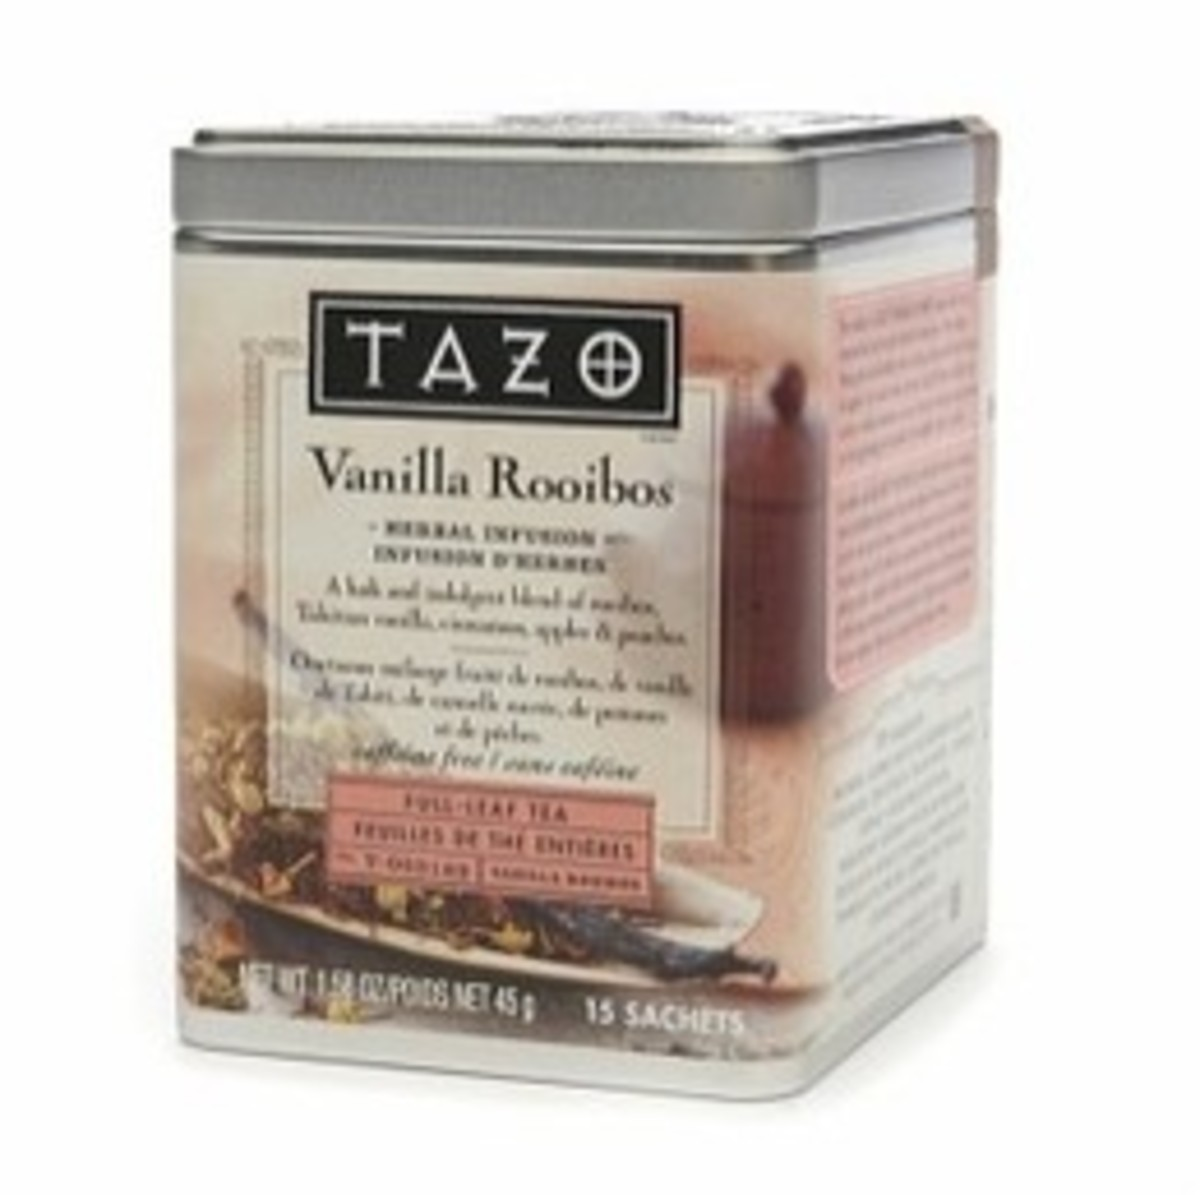 A tin of Tazo Vanilla Rooibos.